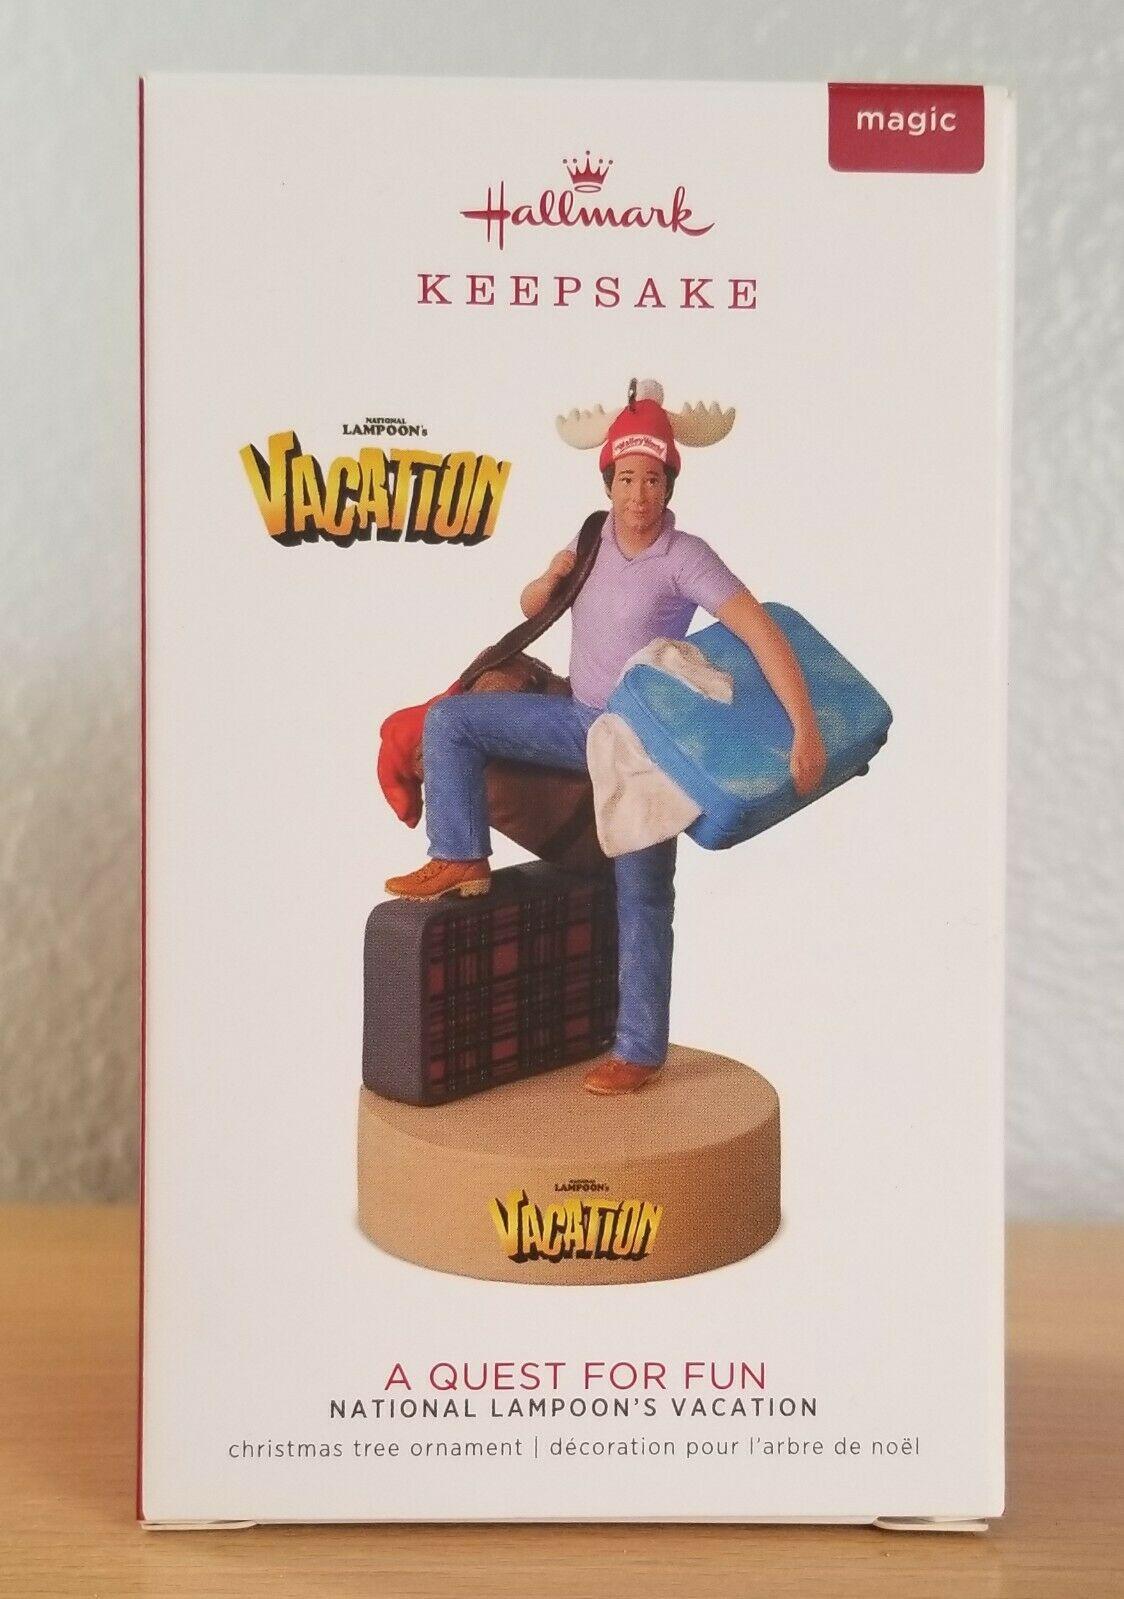 Hallmark Keepsake Magic Ornament 2018 National Lampoons Vacation Quest for Fun